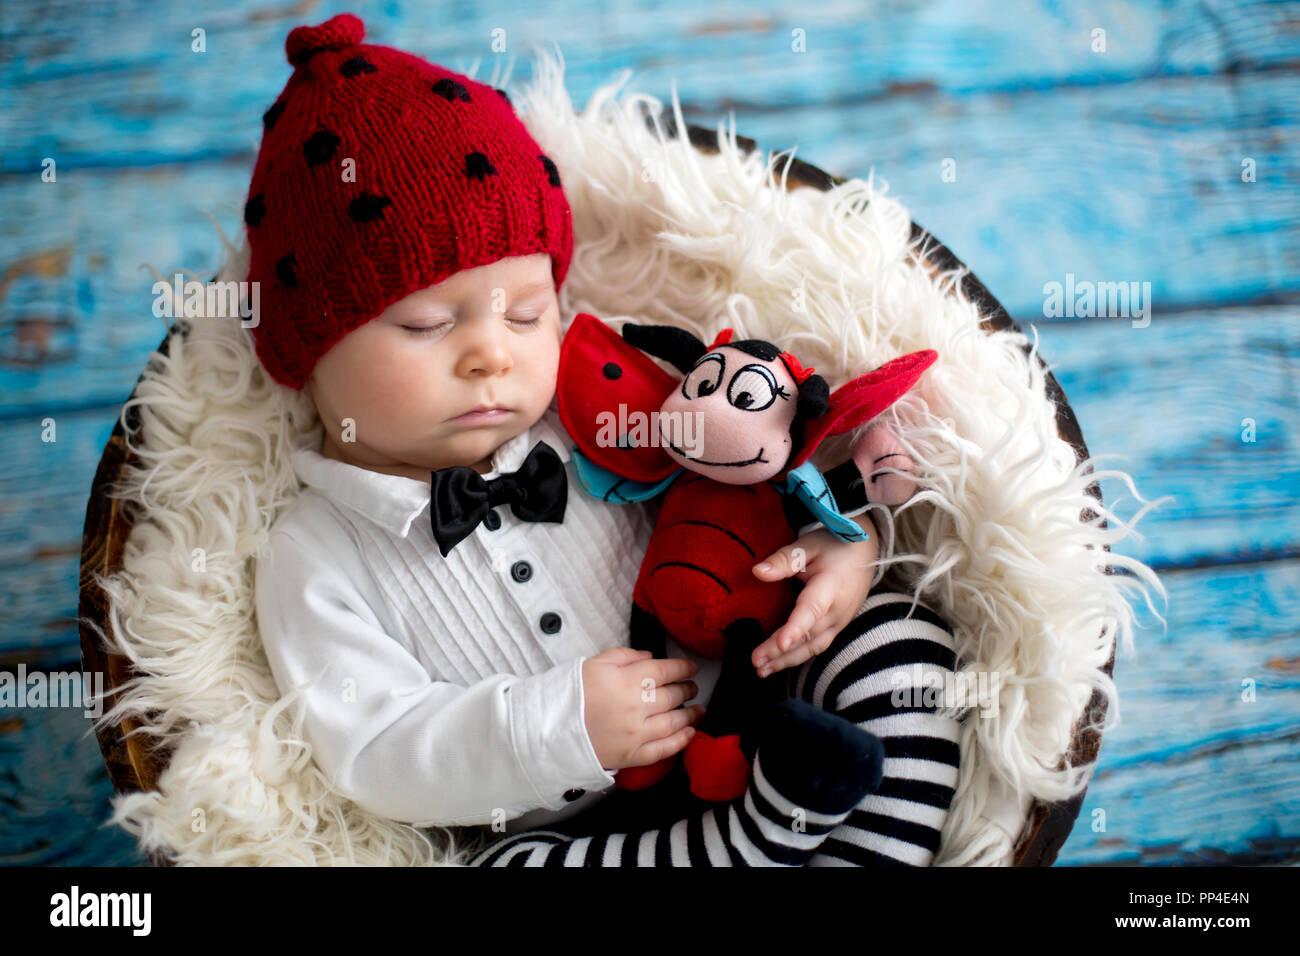 2ff84dafa6b Sleeping Baby Ladybug Stock Photos   Sleeping Baby Ladybug Stock ...